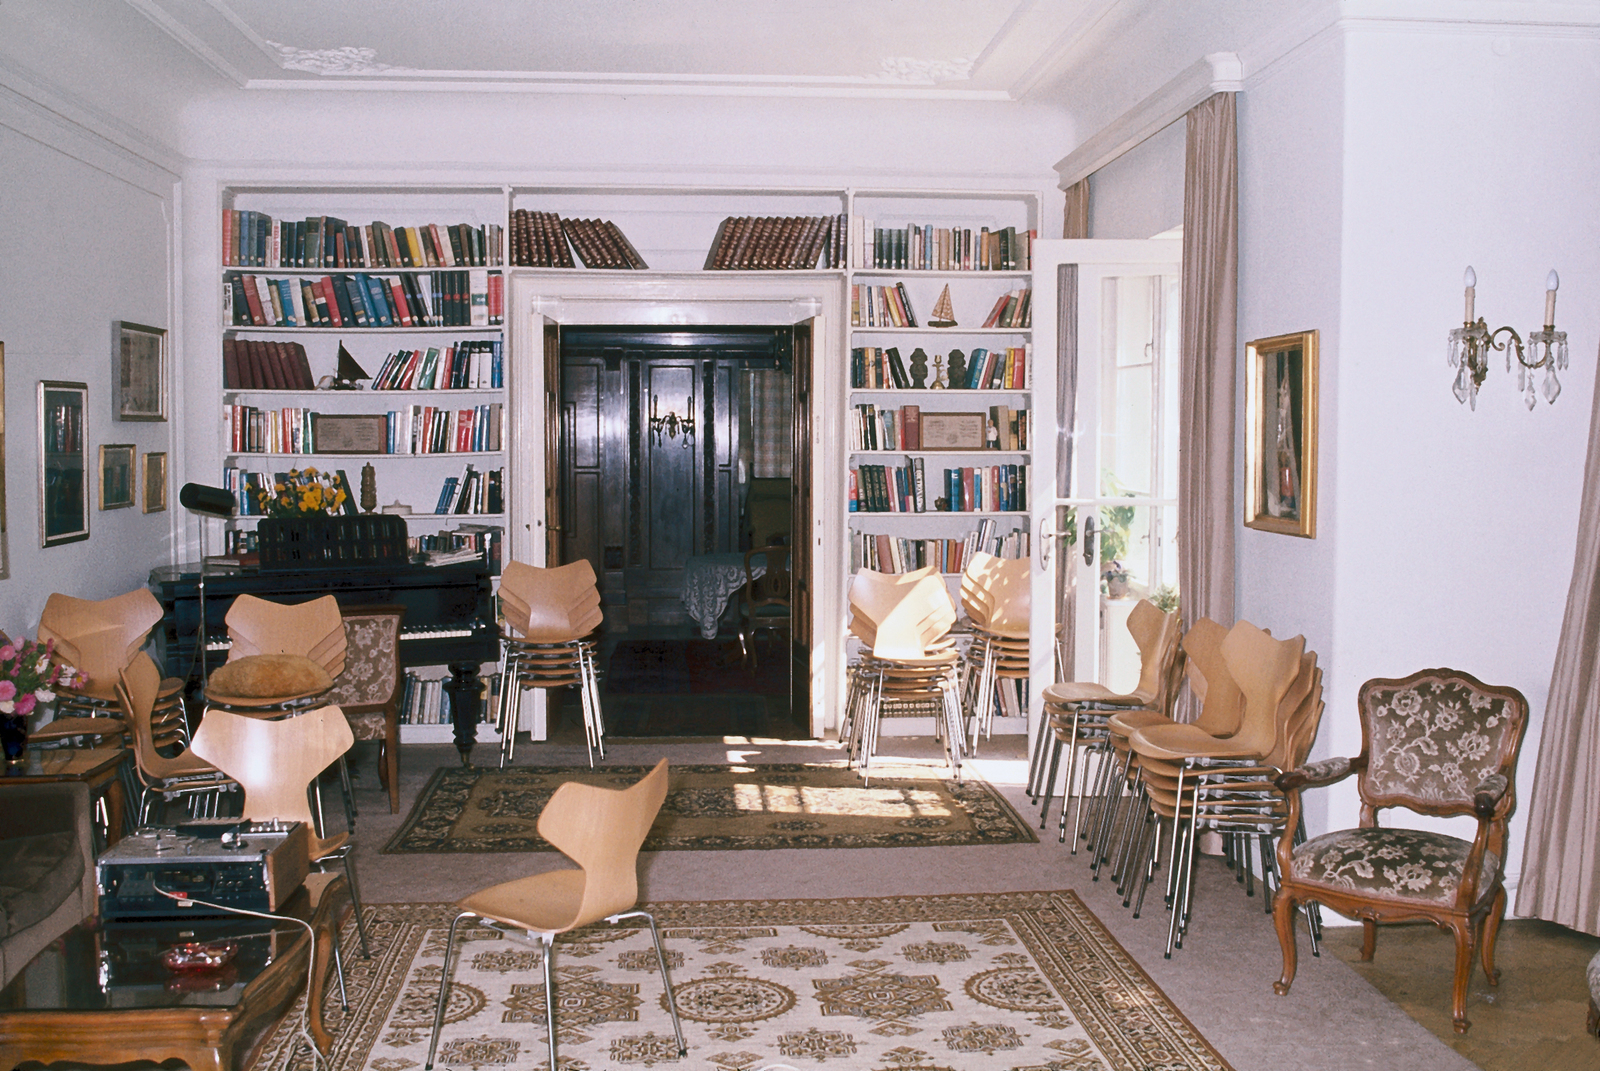 Budapest - Public Affairs Officer Residency - 1976